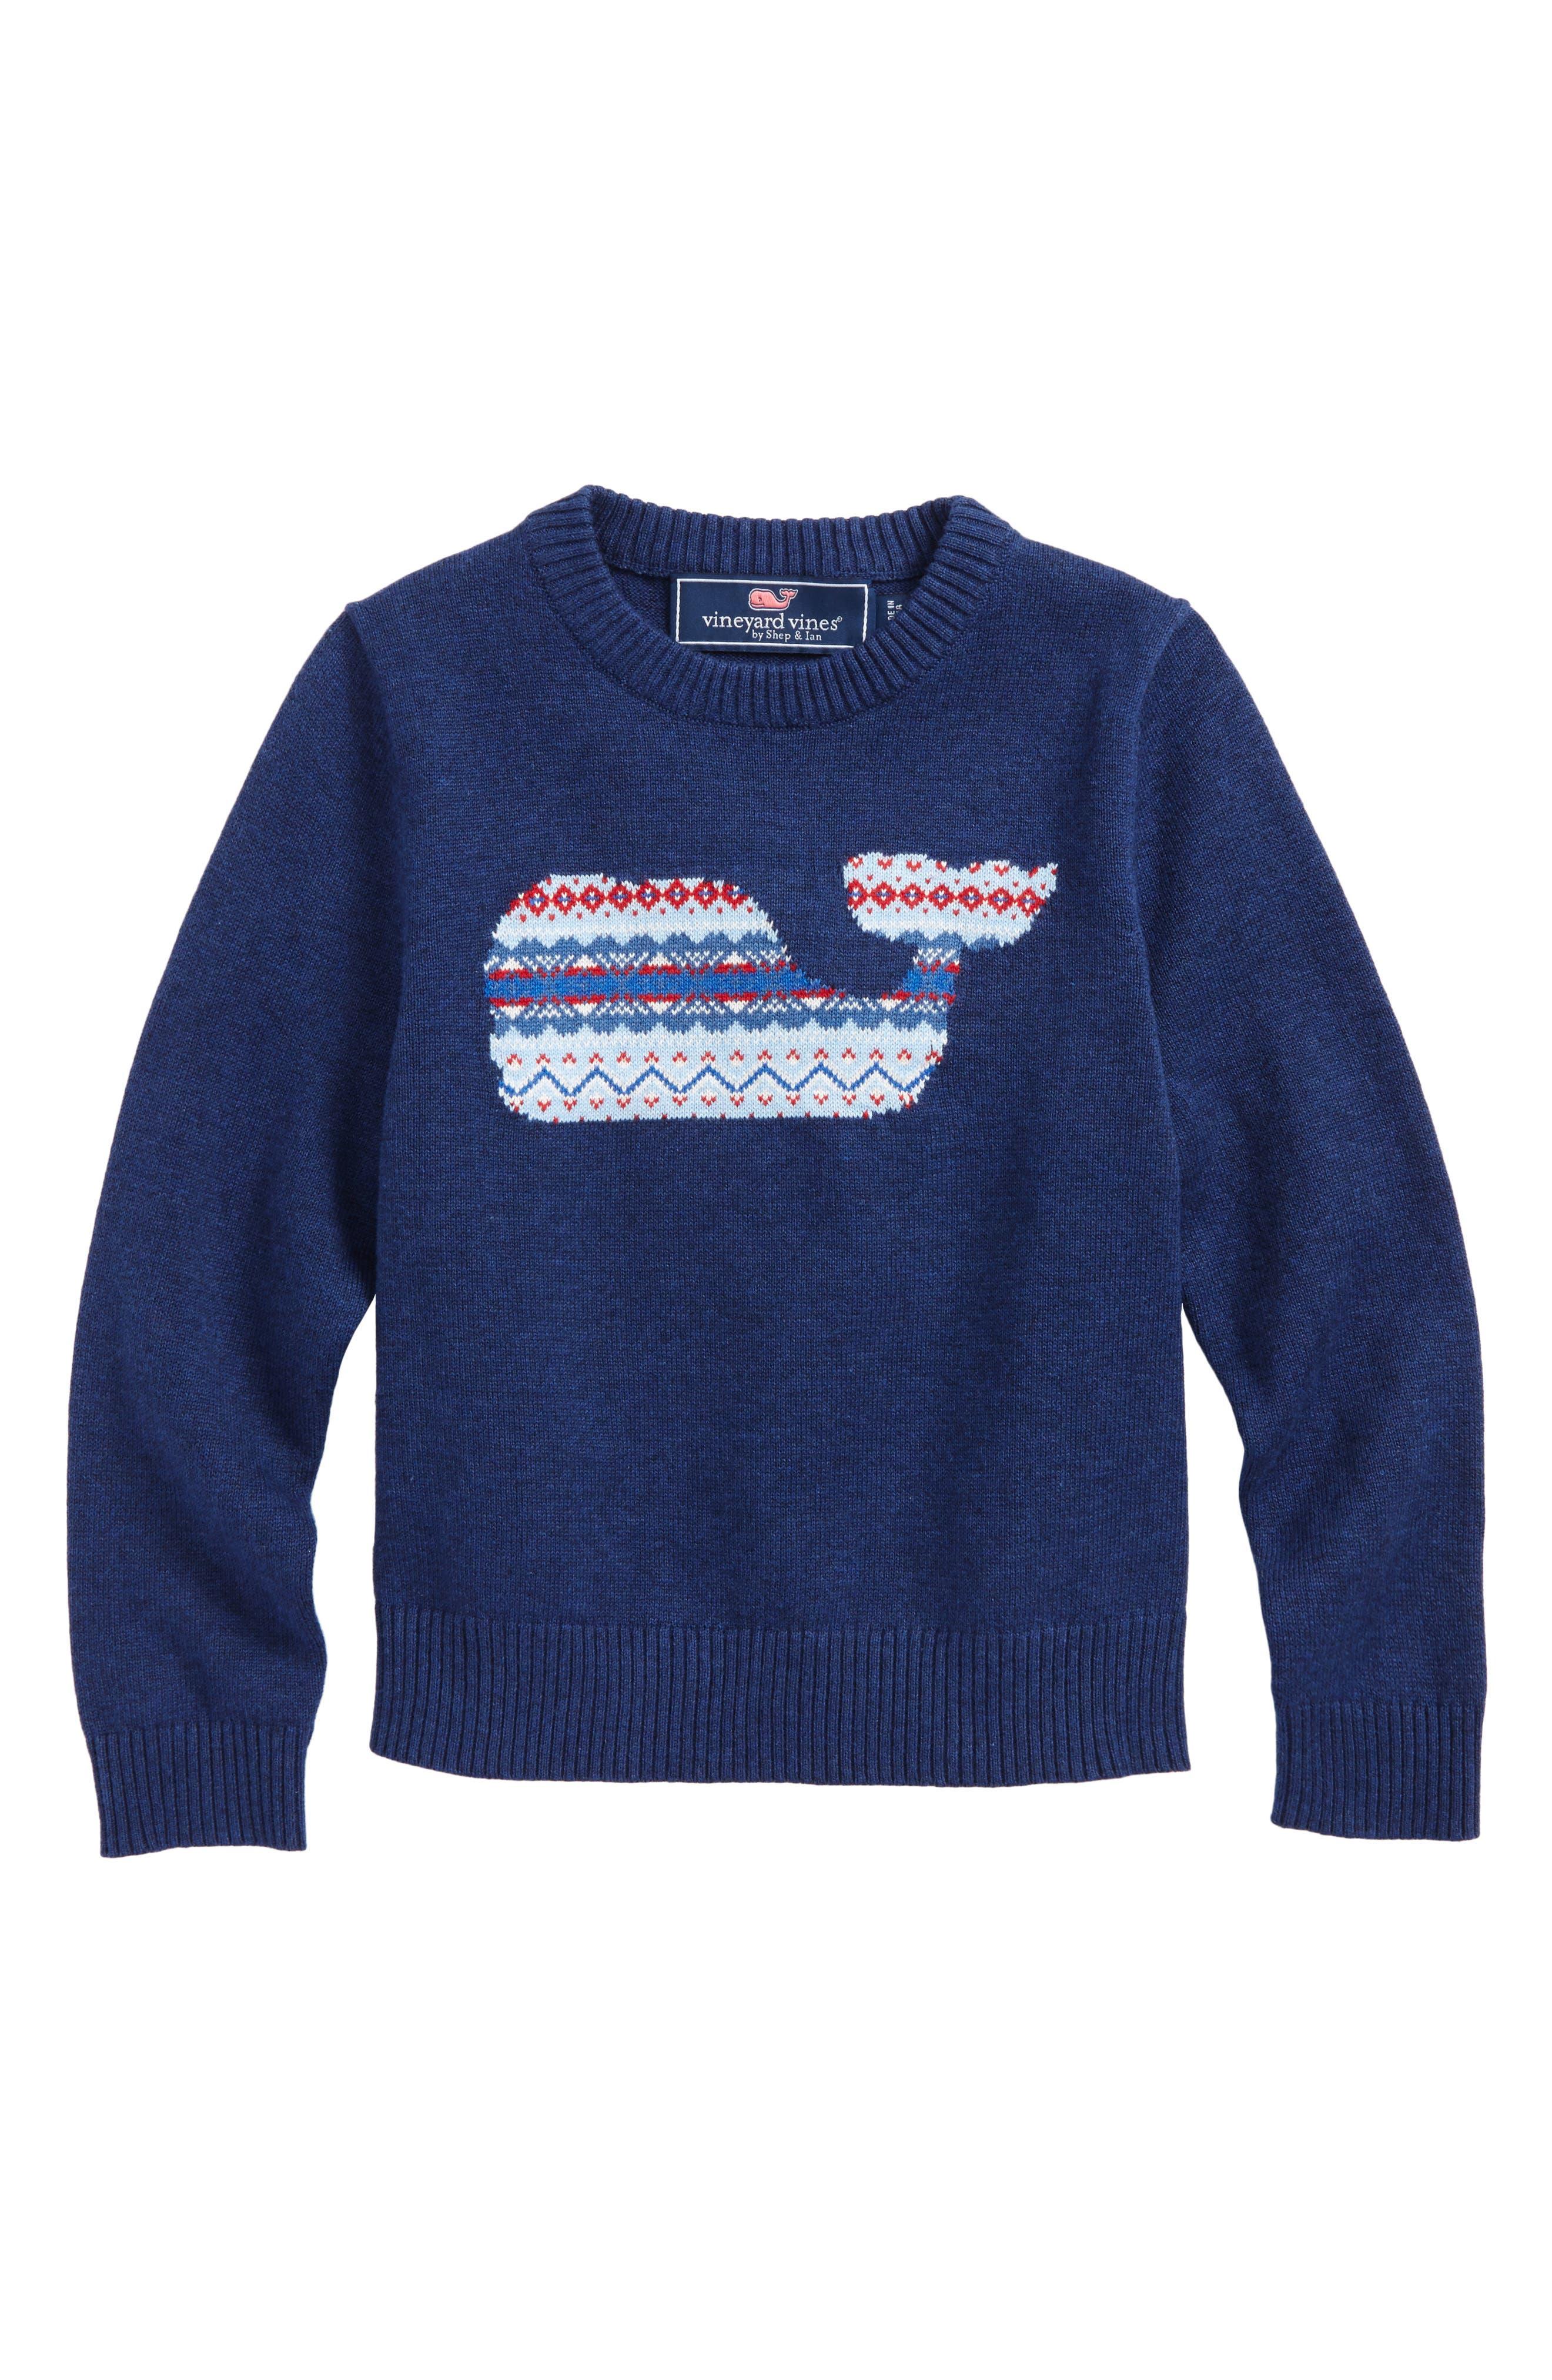 Whale Isle Intarsia Sweater,                         Main,                         color, Deep Bay